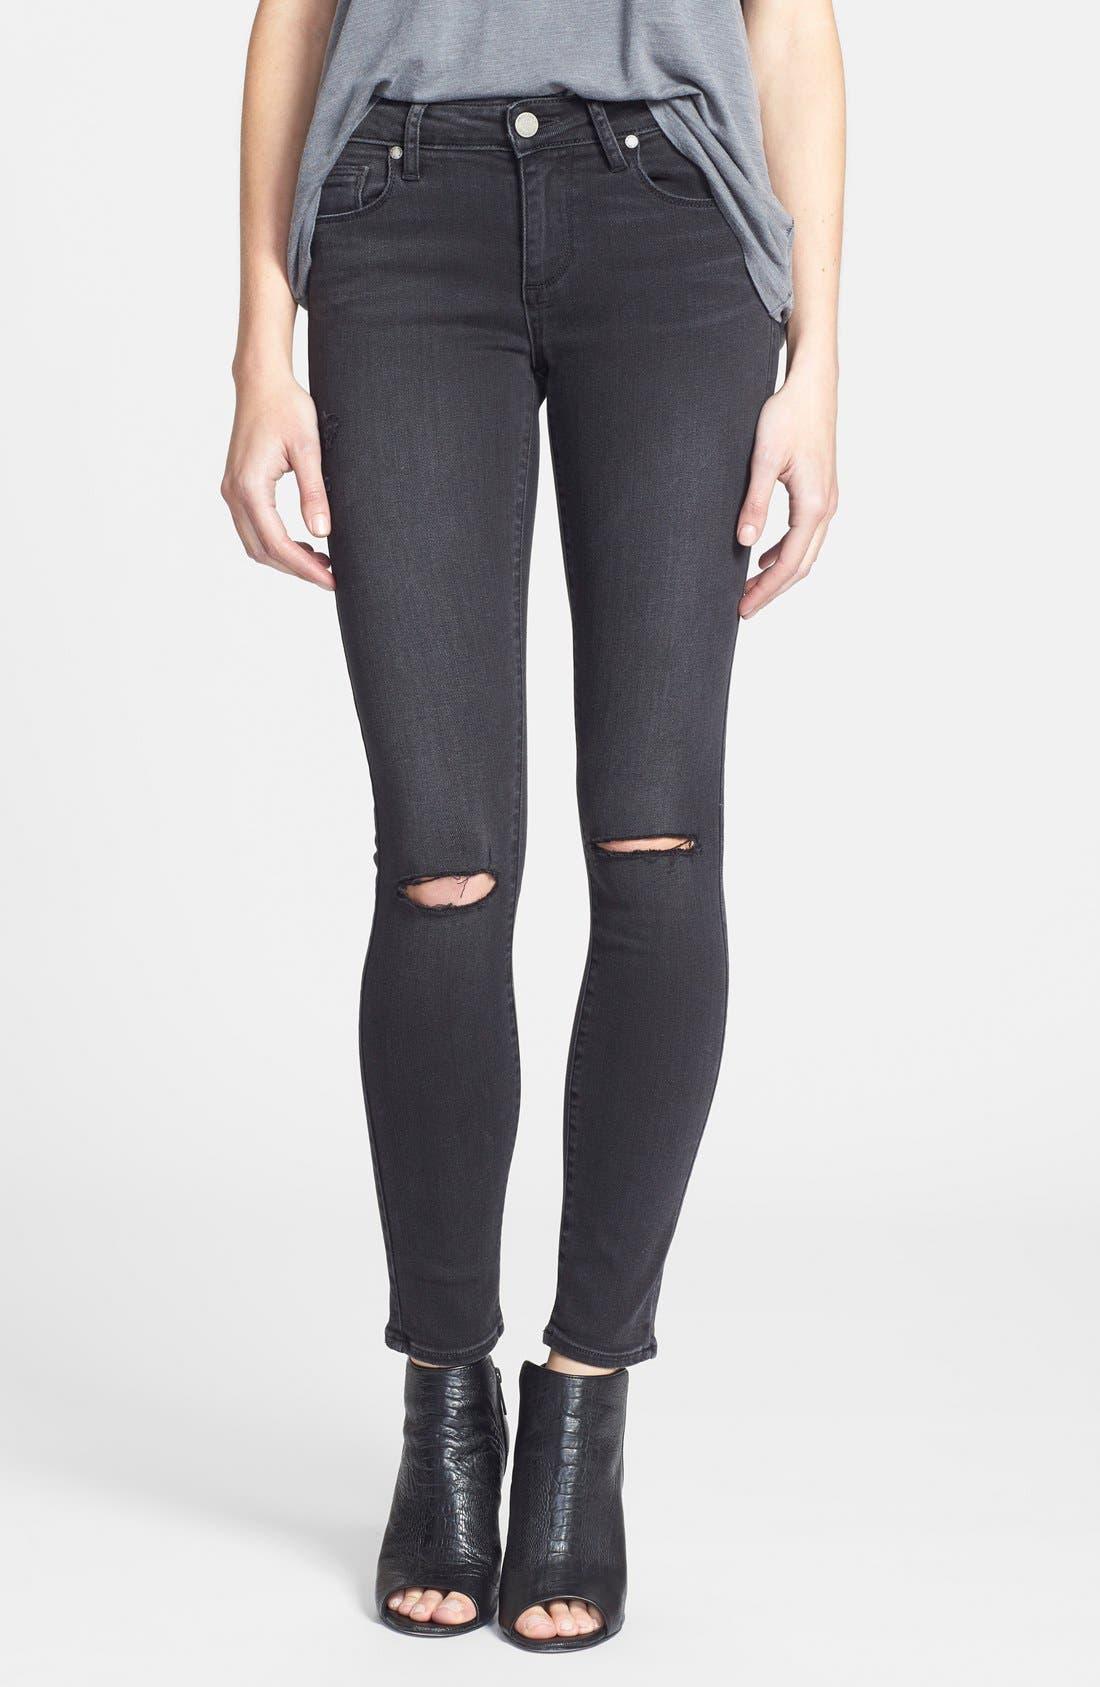 Alternate Image 1 Selected - Paige Denim 'Verdugo' Ultra Skinny Jeans (Rayed Destructed)